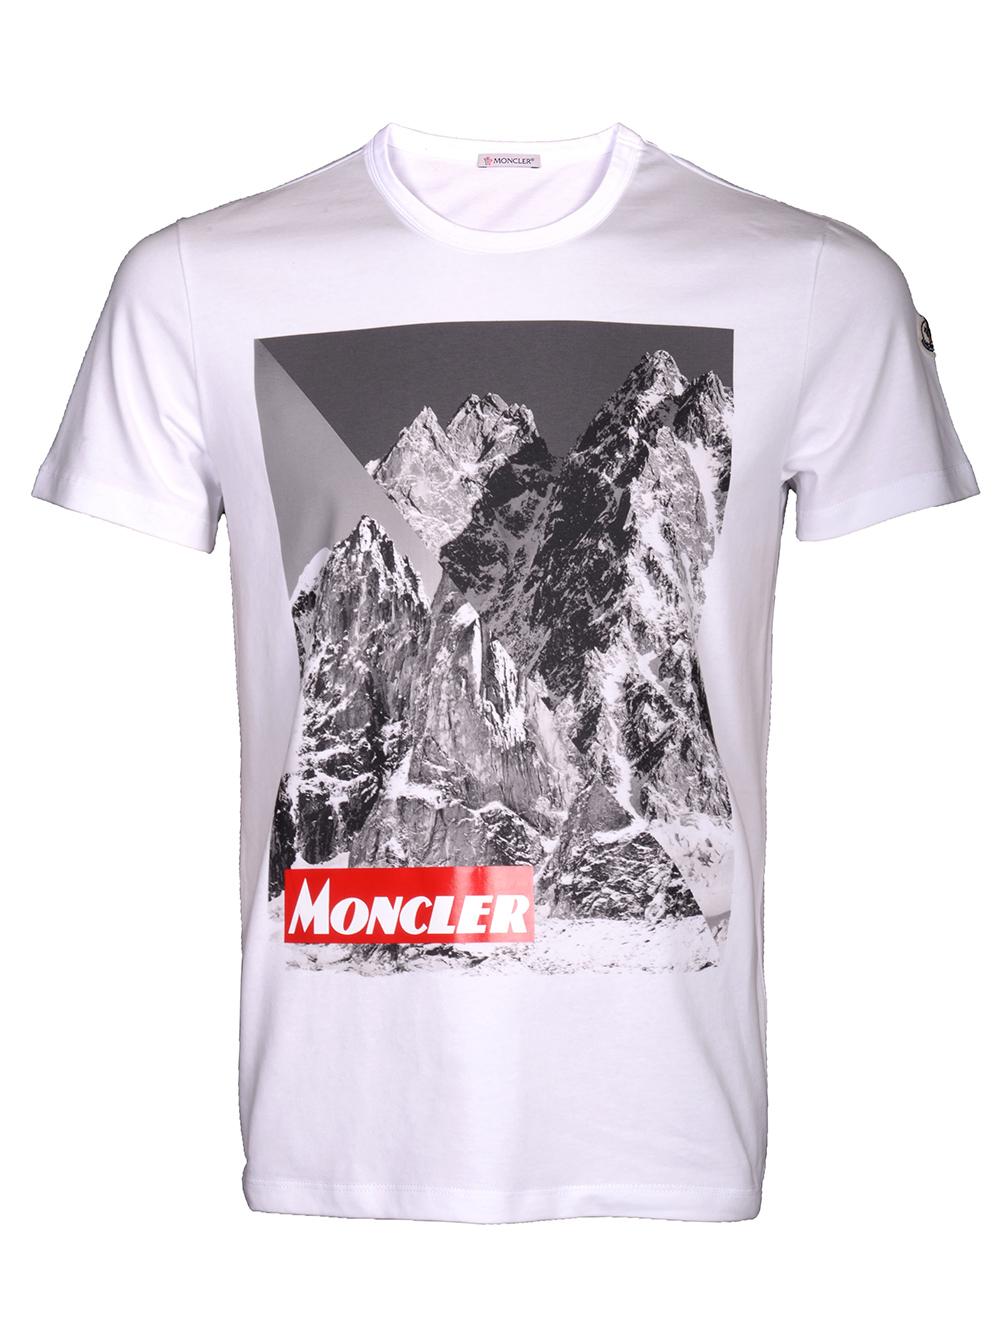 MONCLER Μπλούζα Τ-shirt E2-091-8048350 8390T ΛΕΥΚΟ